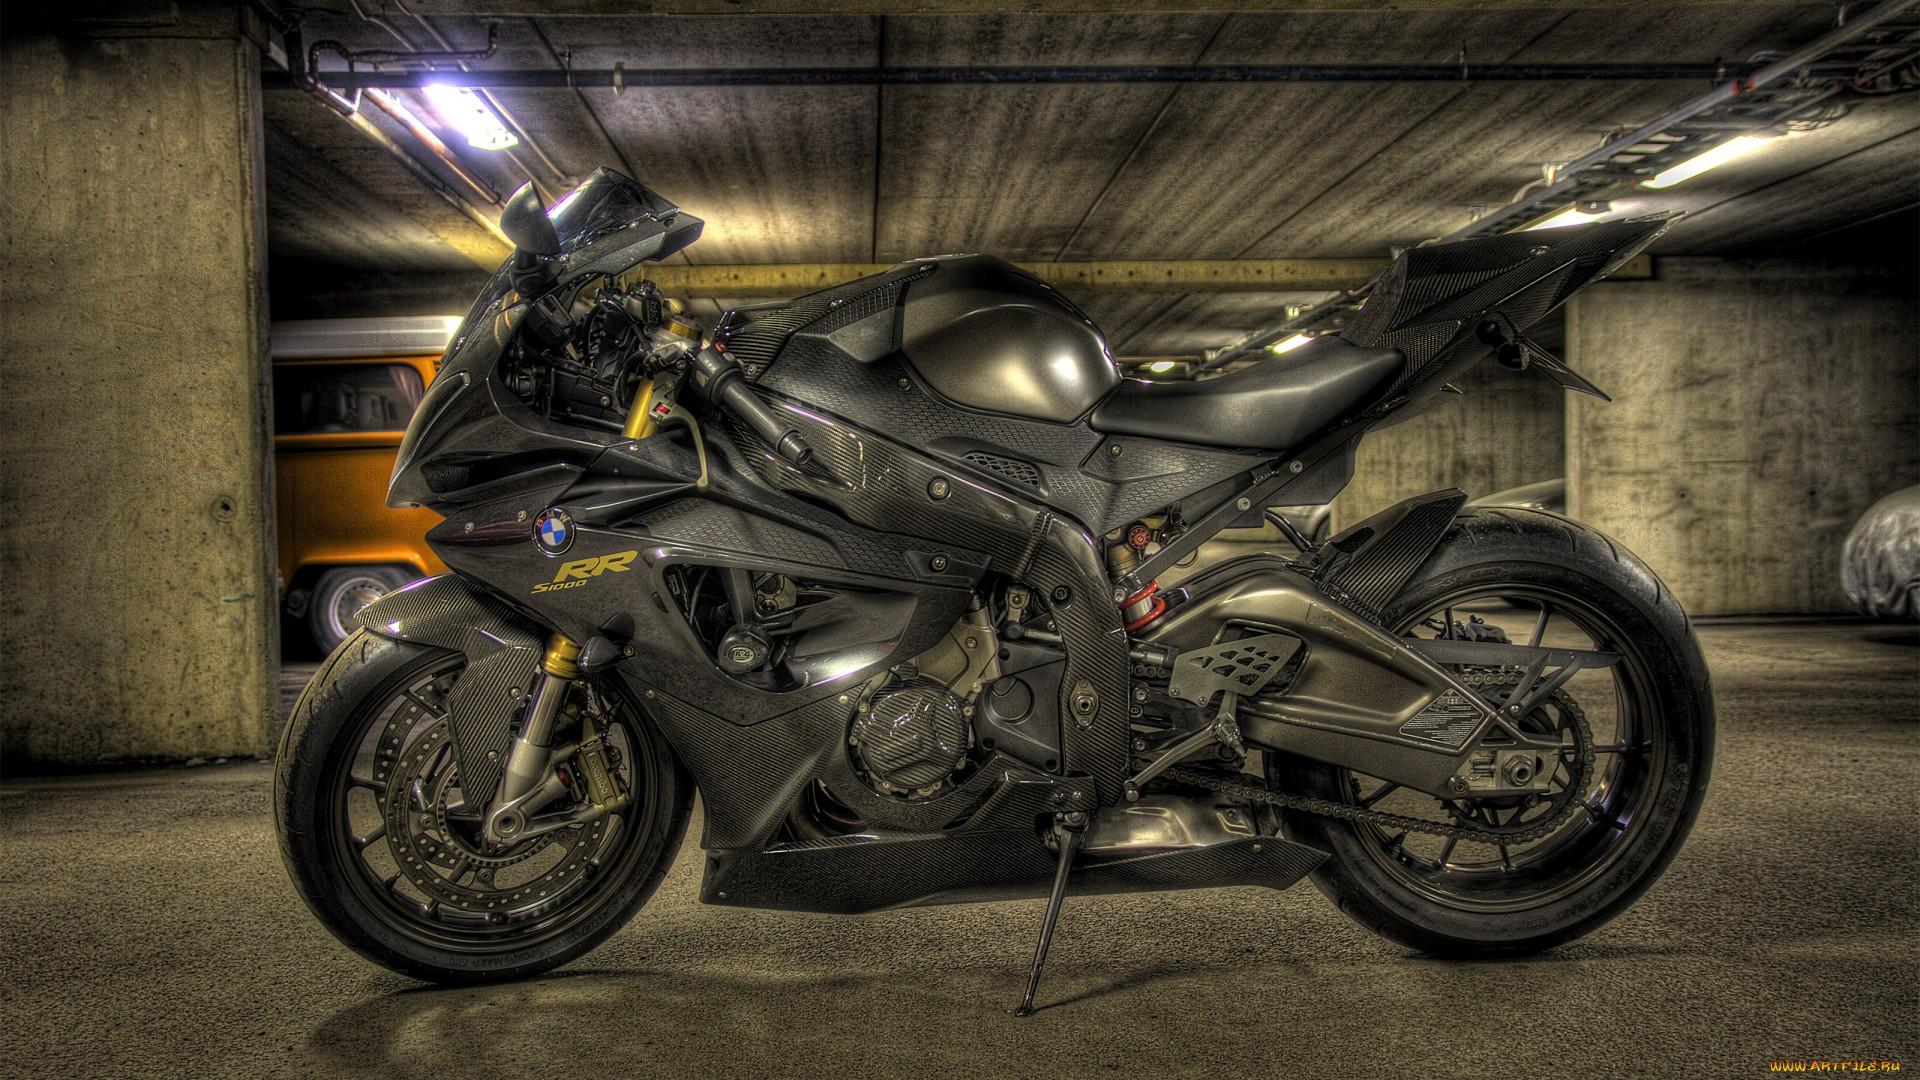 мотоциклы обои на рабочий стол фото № 596535 бесплатно